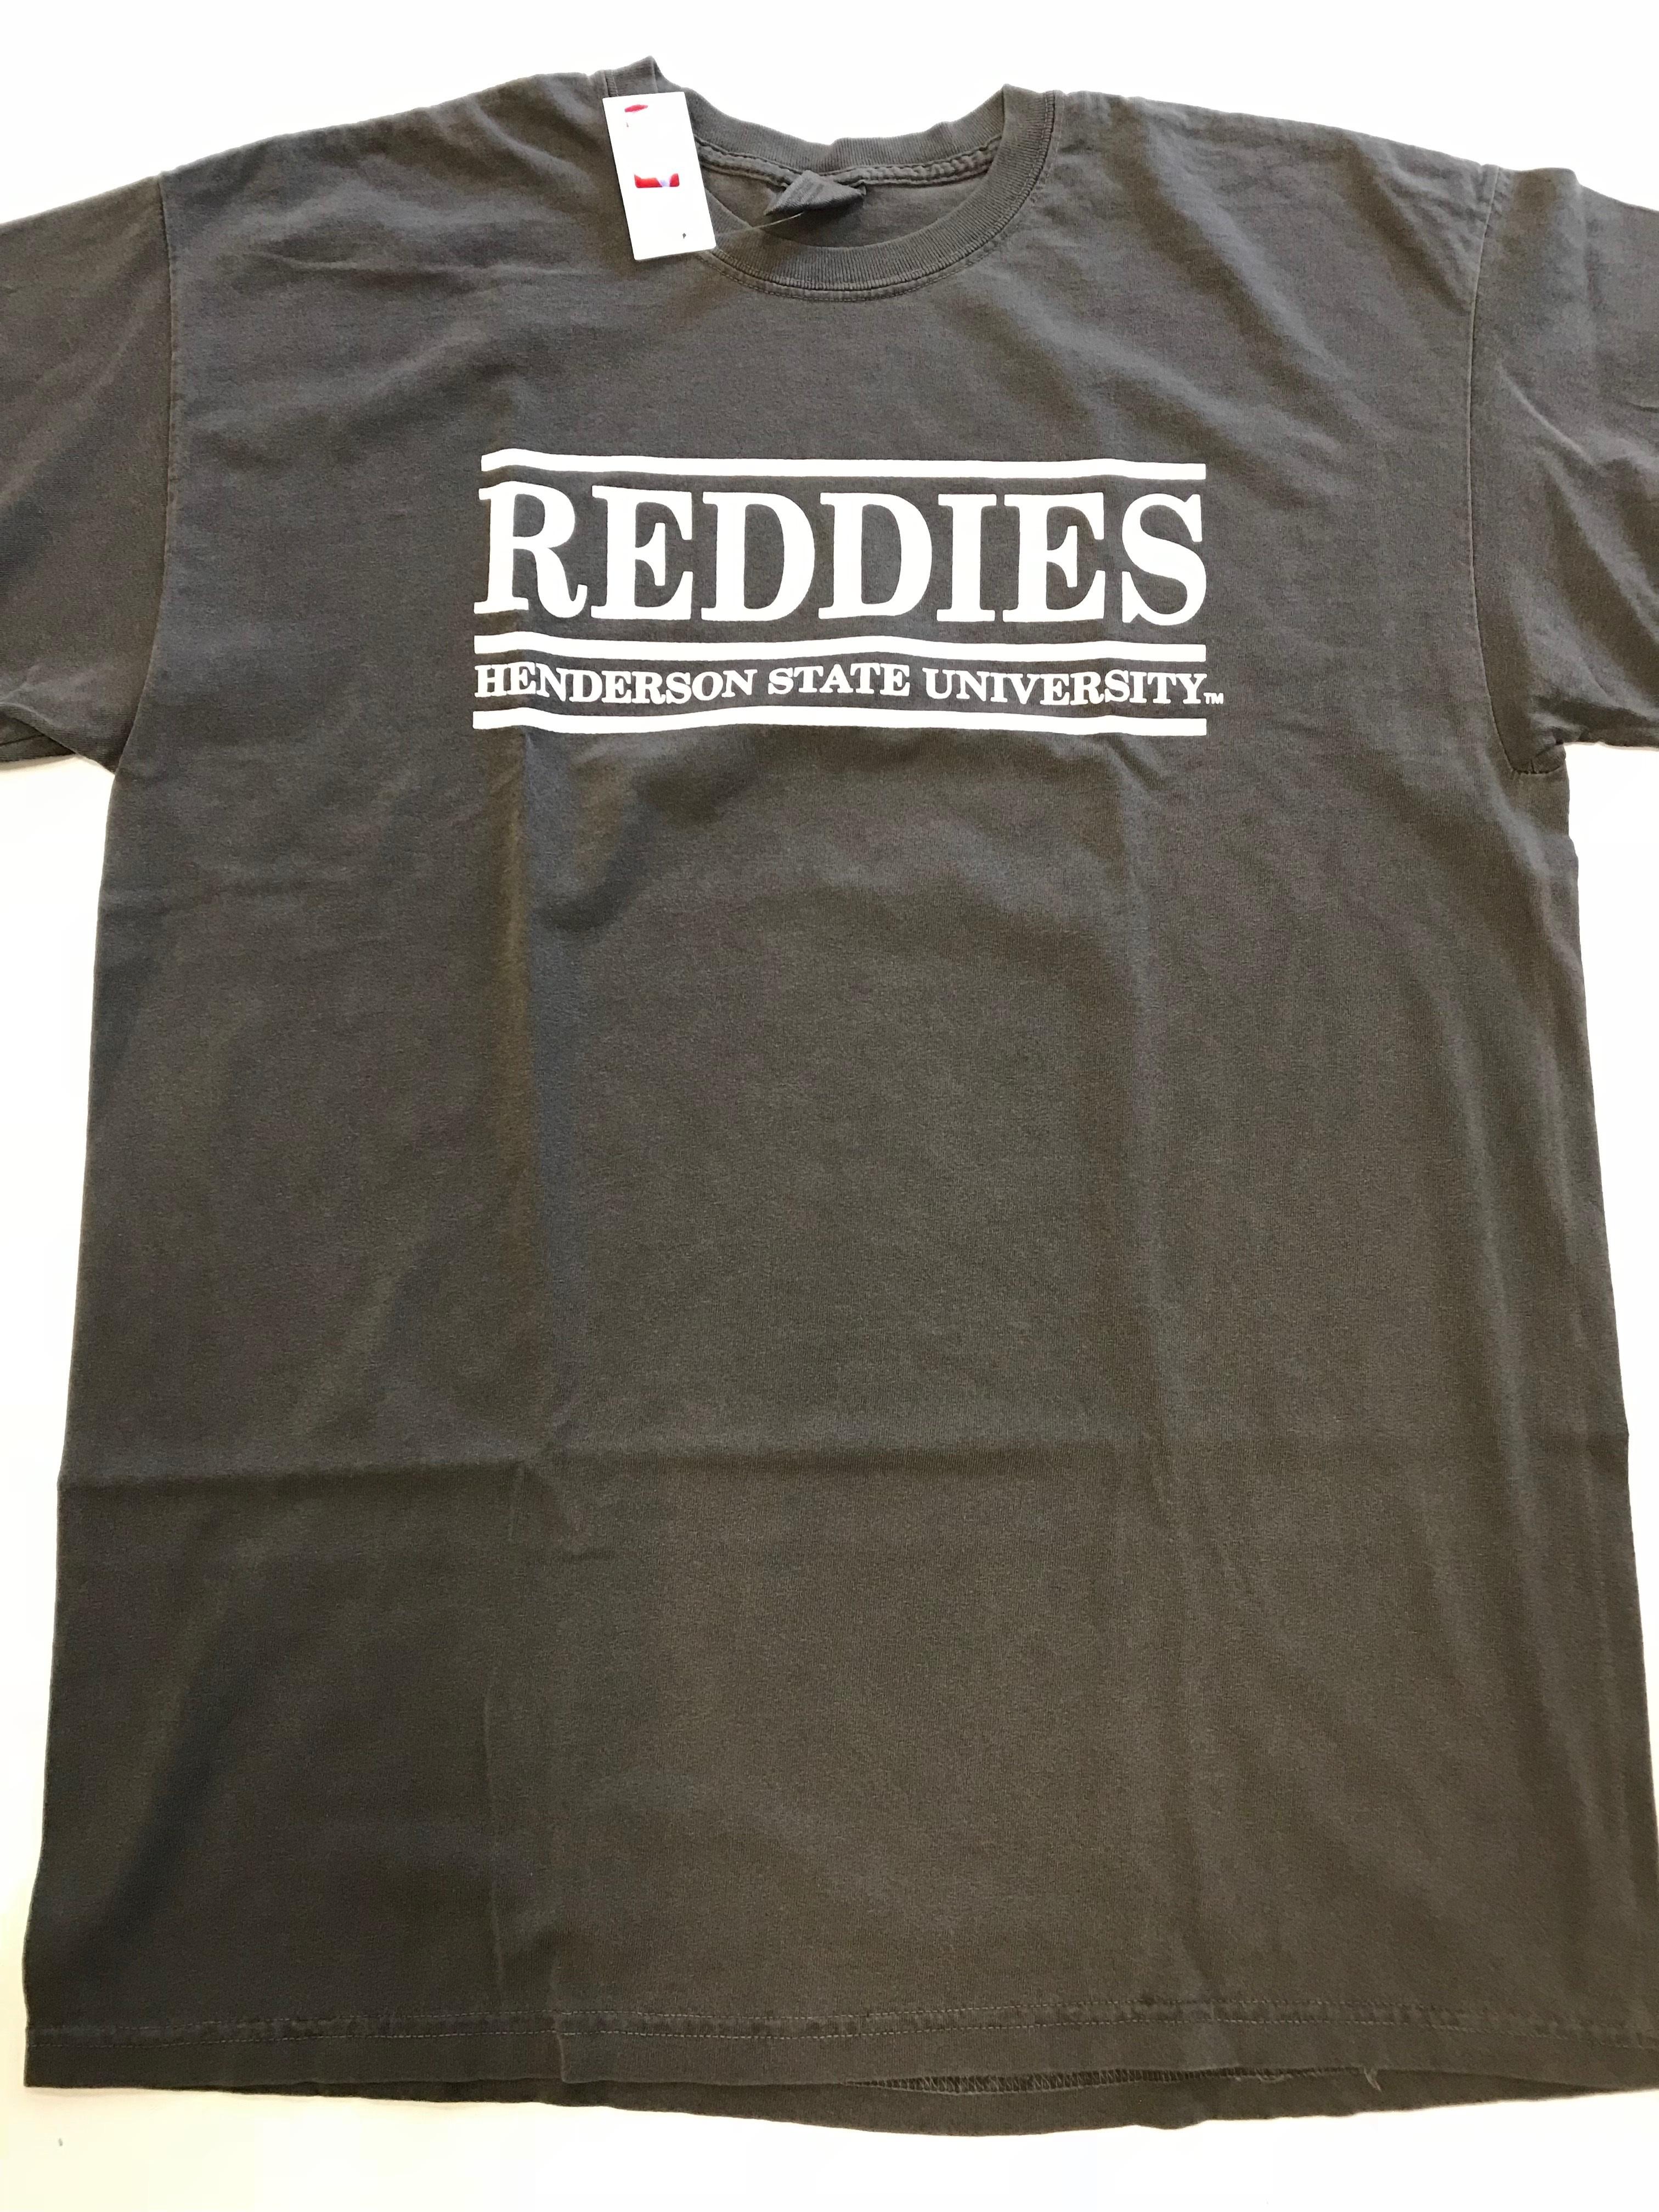 REDDIES HENDERSON STATE TSHIRT